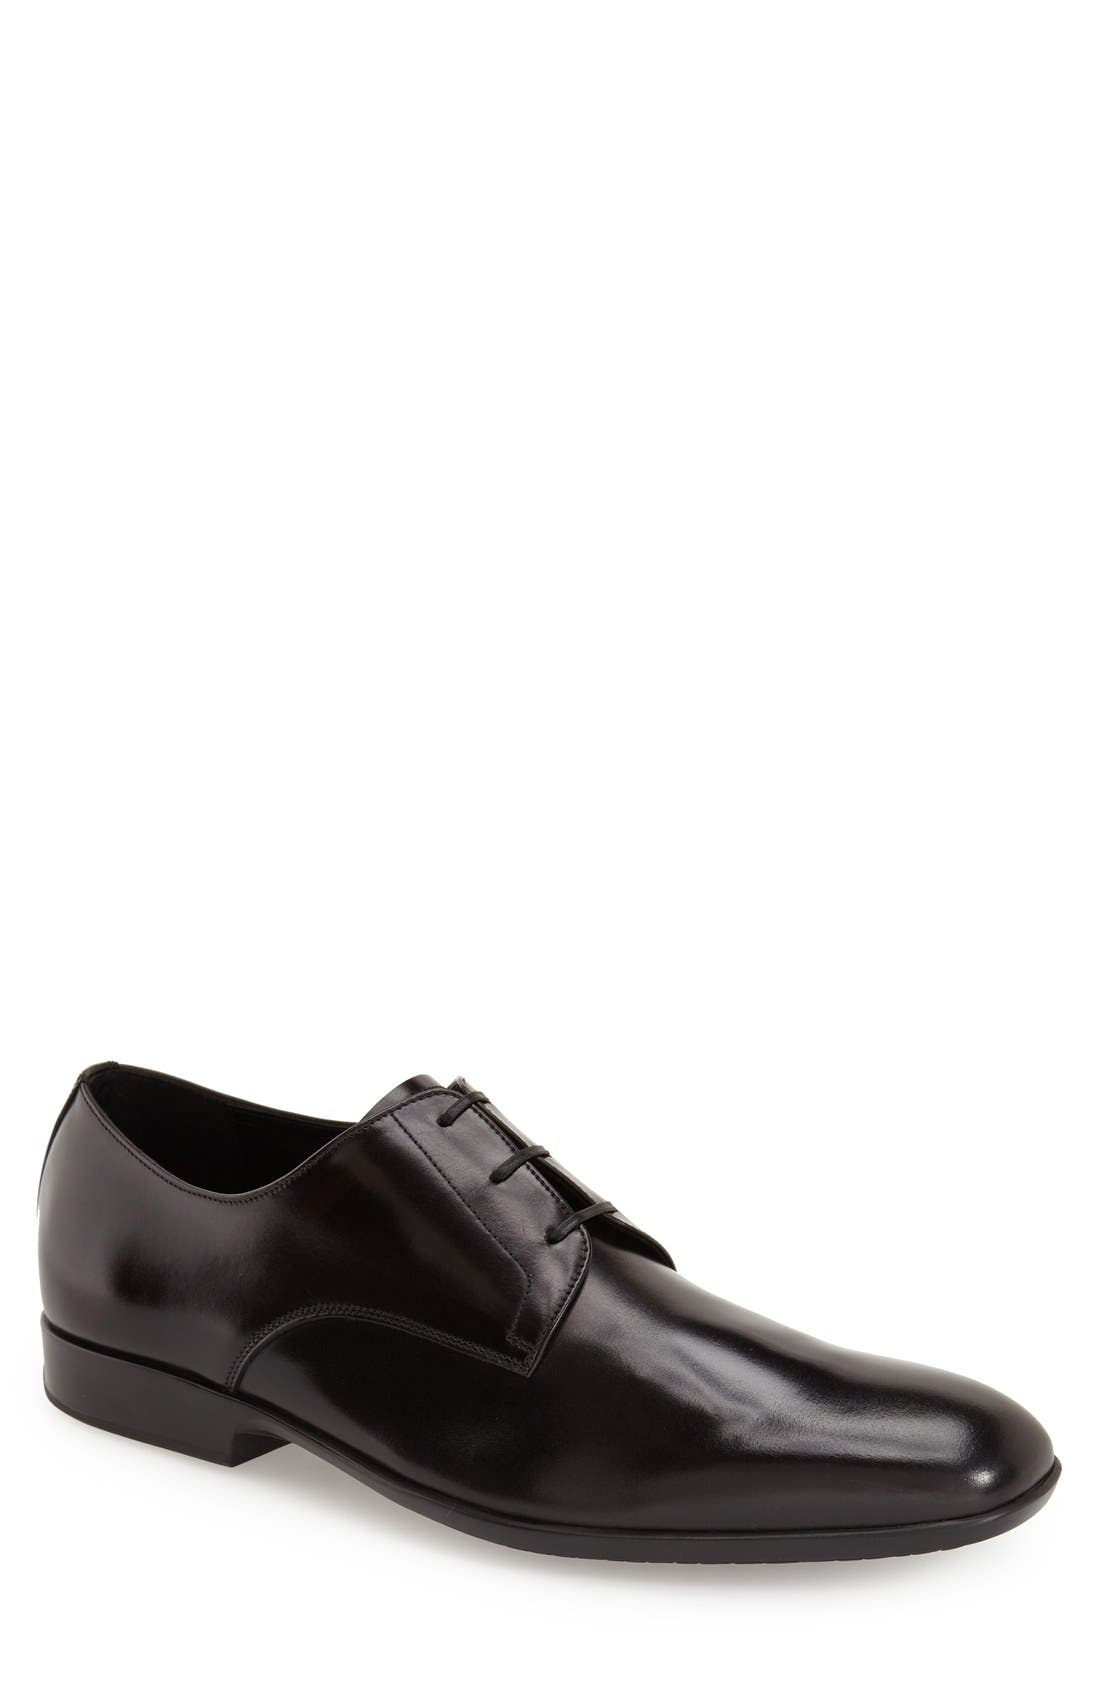 Alternate Image 1 Selected - Salvatore Ferragamo 'Laurent' Plain Toe Derby (Men)